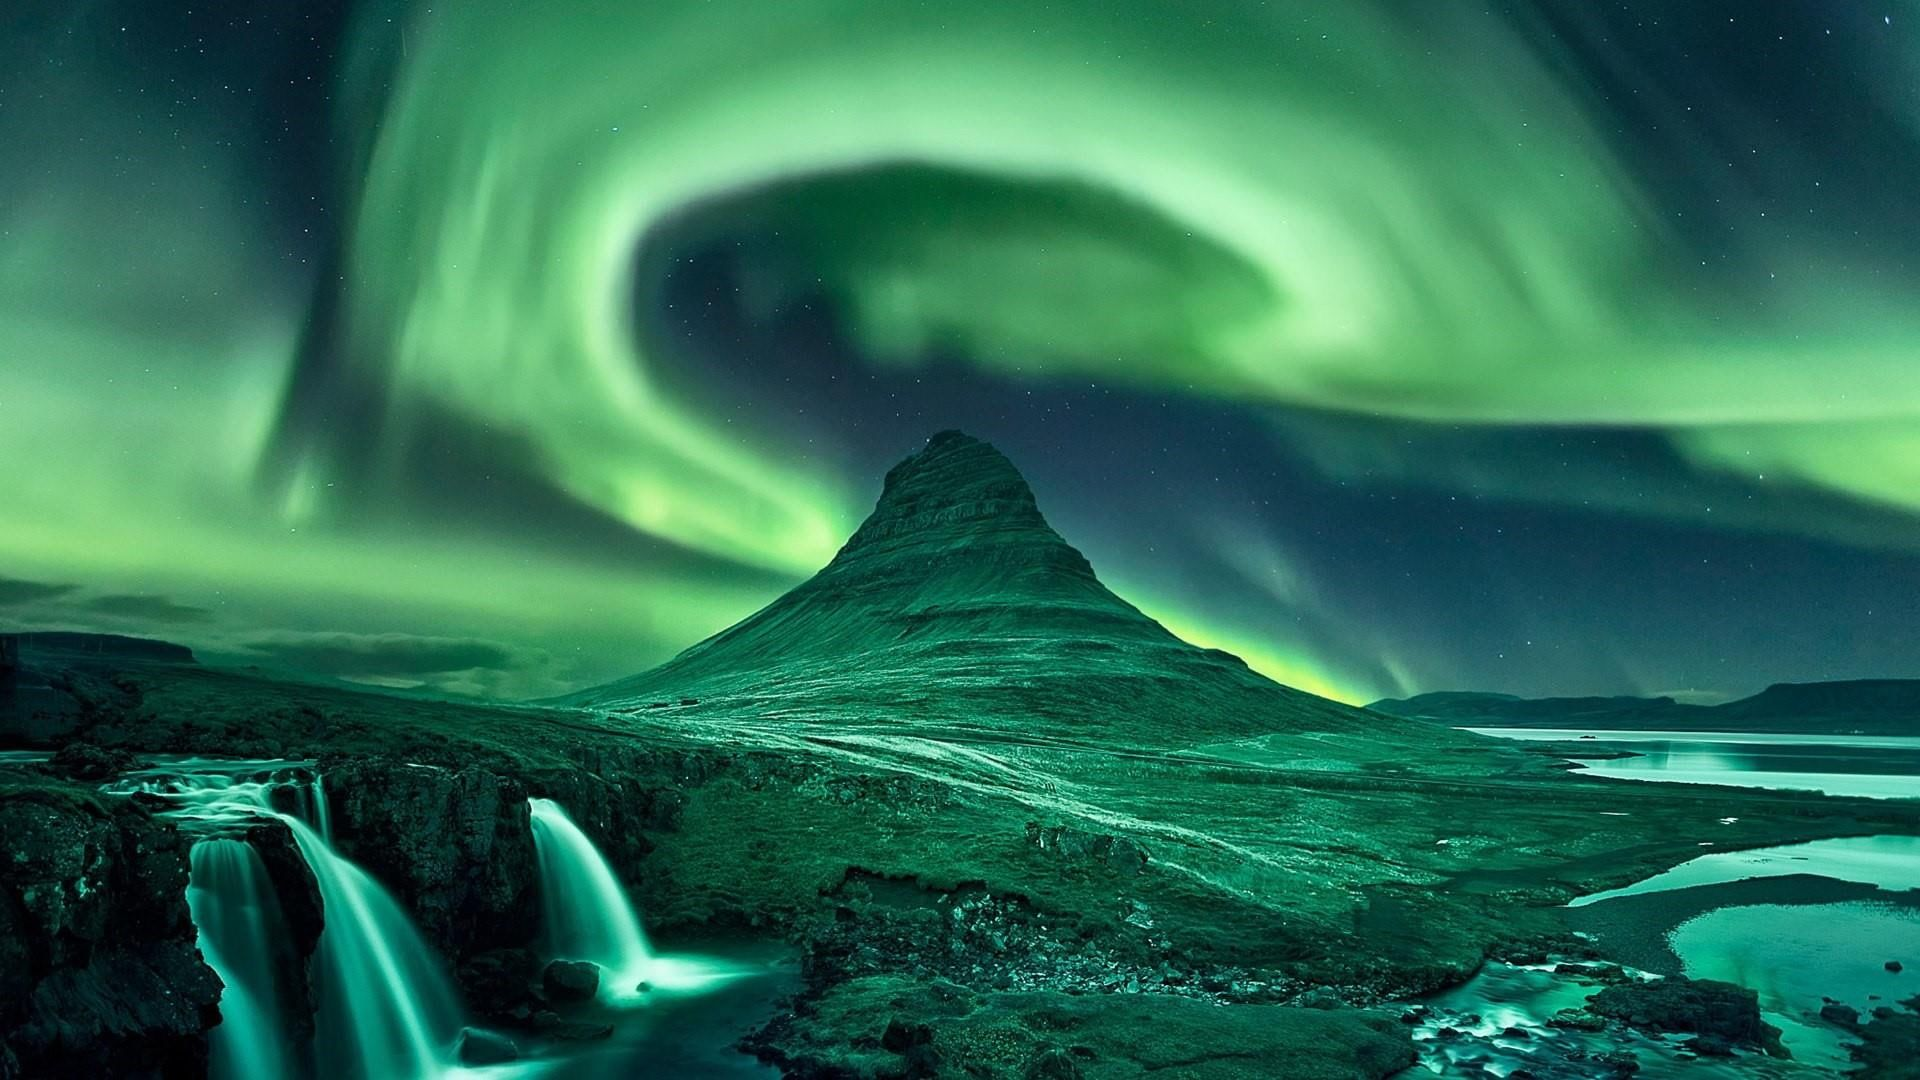 Northern Lights Aurora Borealis Kirkjufell Grundarfjorour Iceland Polar Lights Nature Atmosp In 2020 Aurora Borealis Aurora Borealis Poster Northern Lights Canvas